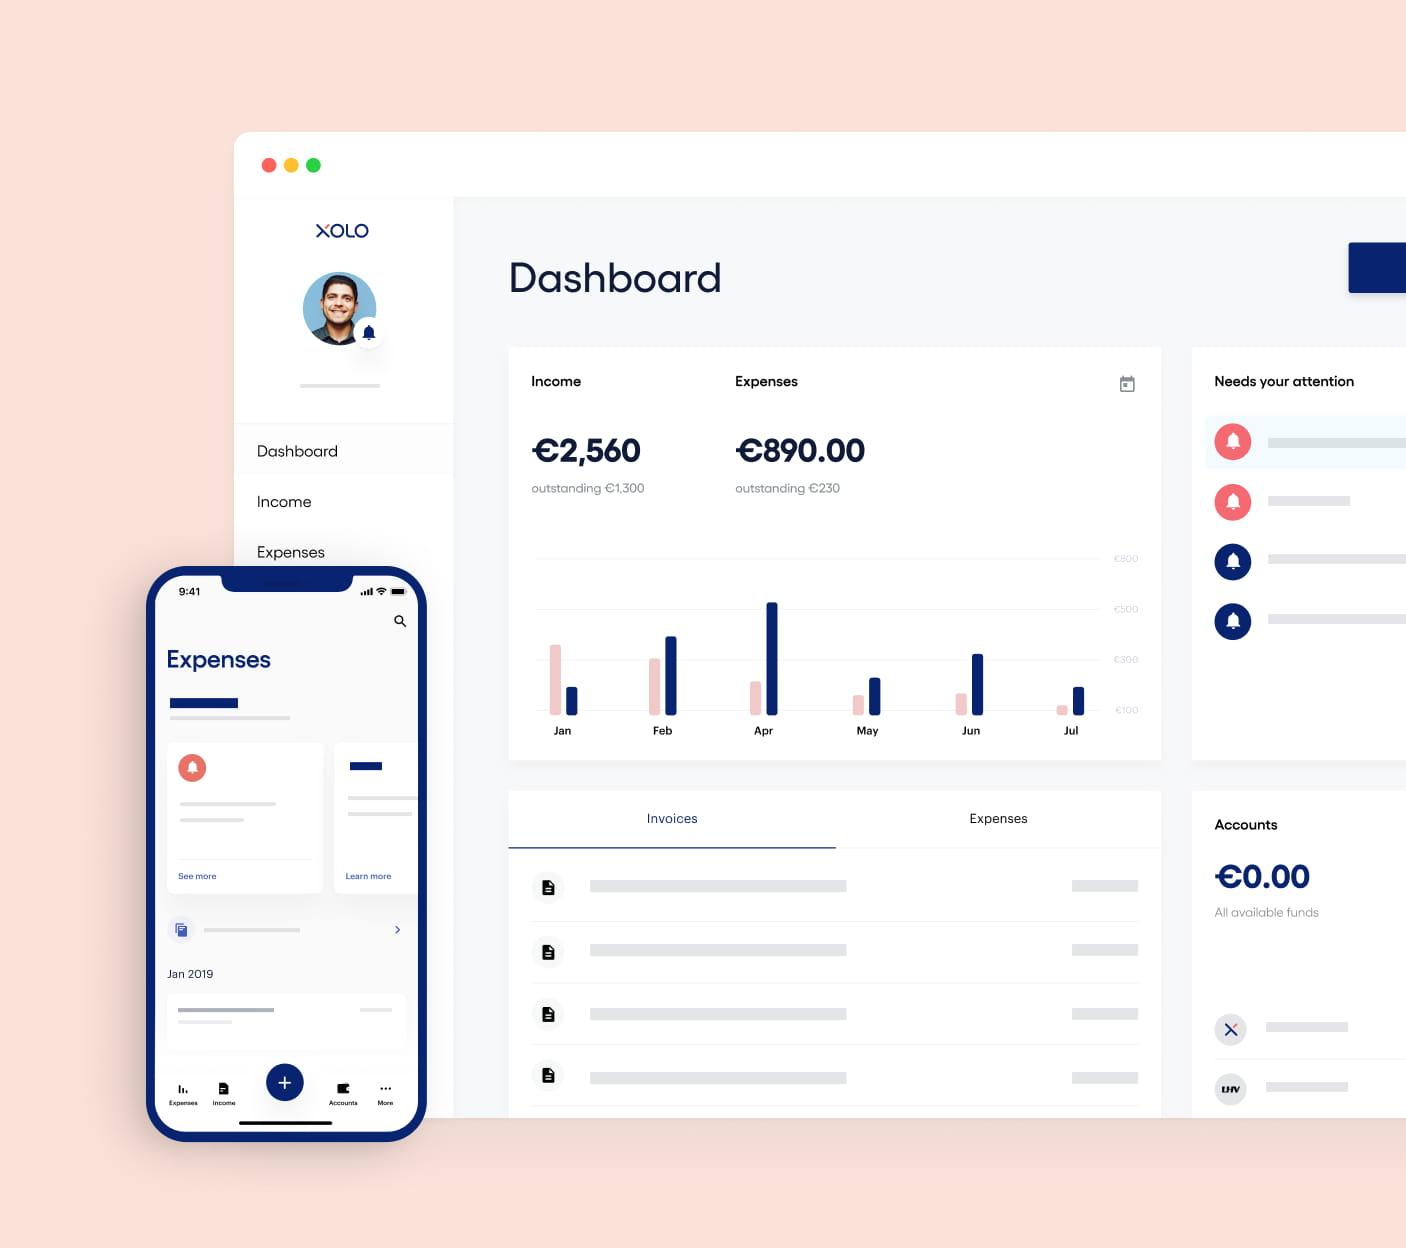 Image of Xolo dashboard